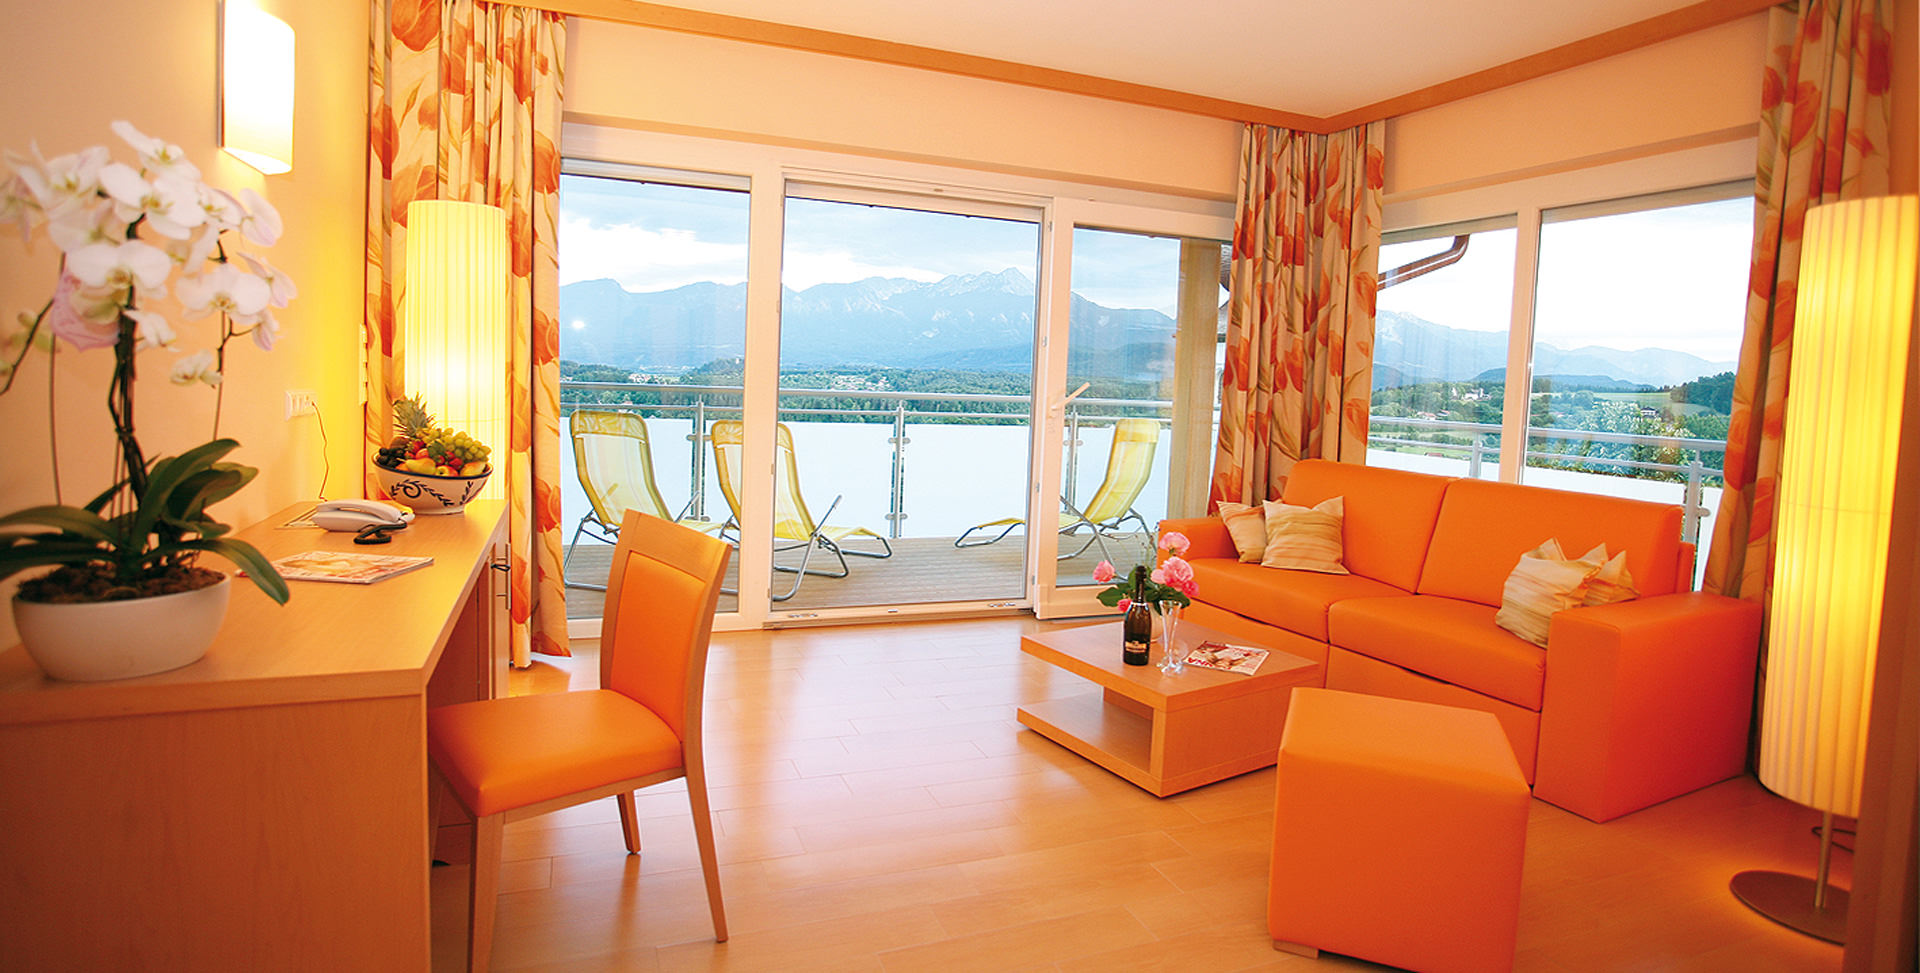 Zimmer-Suite-Marko-Hotel-Velden